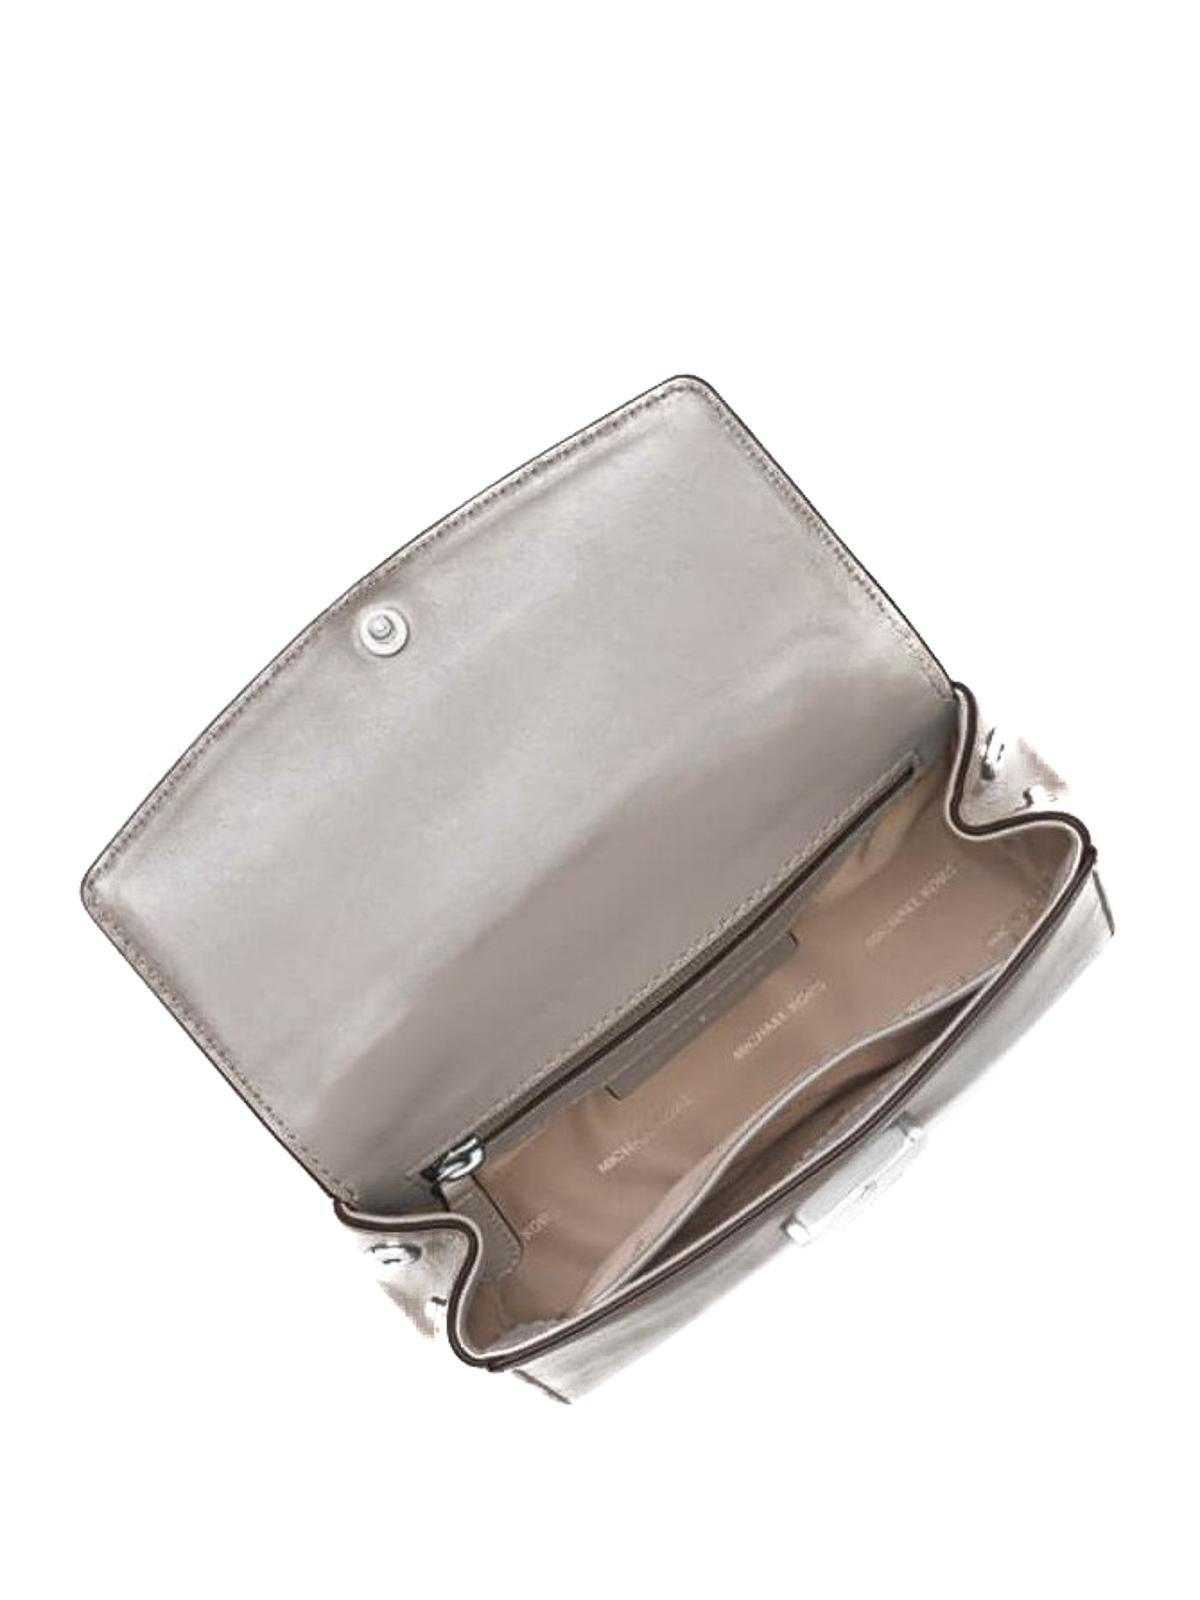 201cc41336a7 iKRIX MICHAEL KORS  cross body bags - Ava grey leather mini crossbody bag